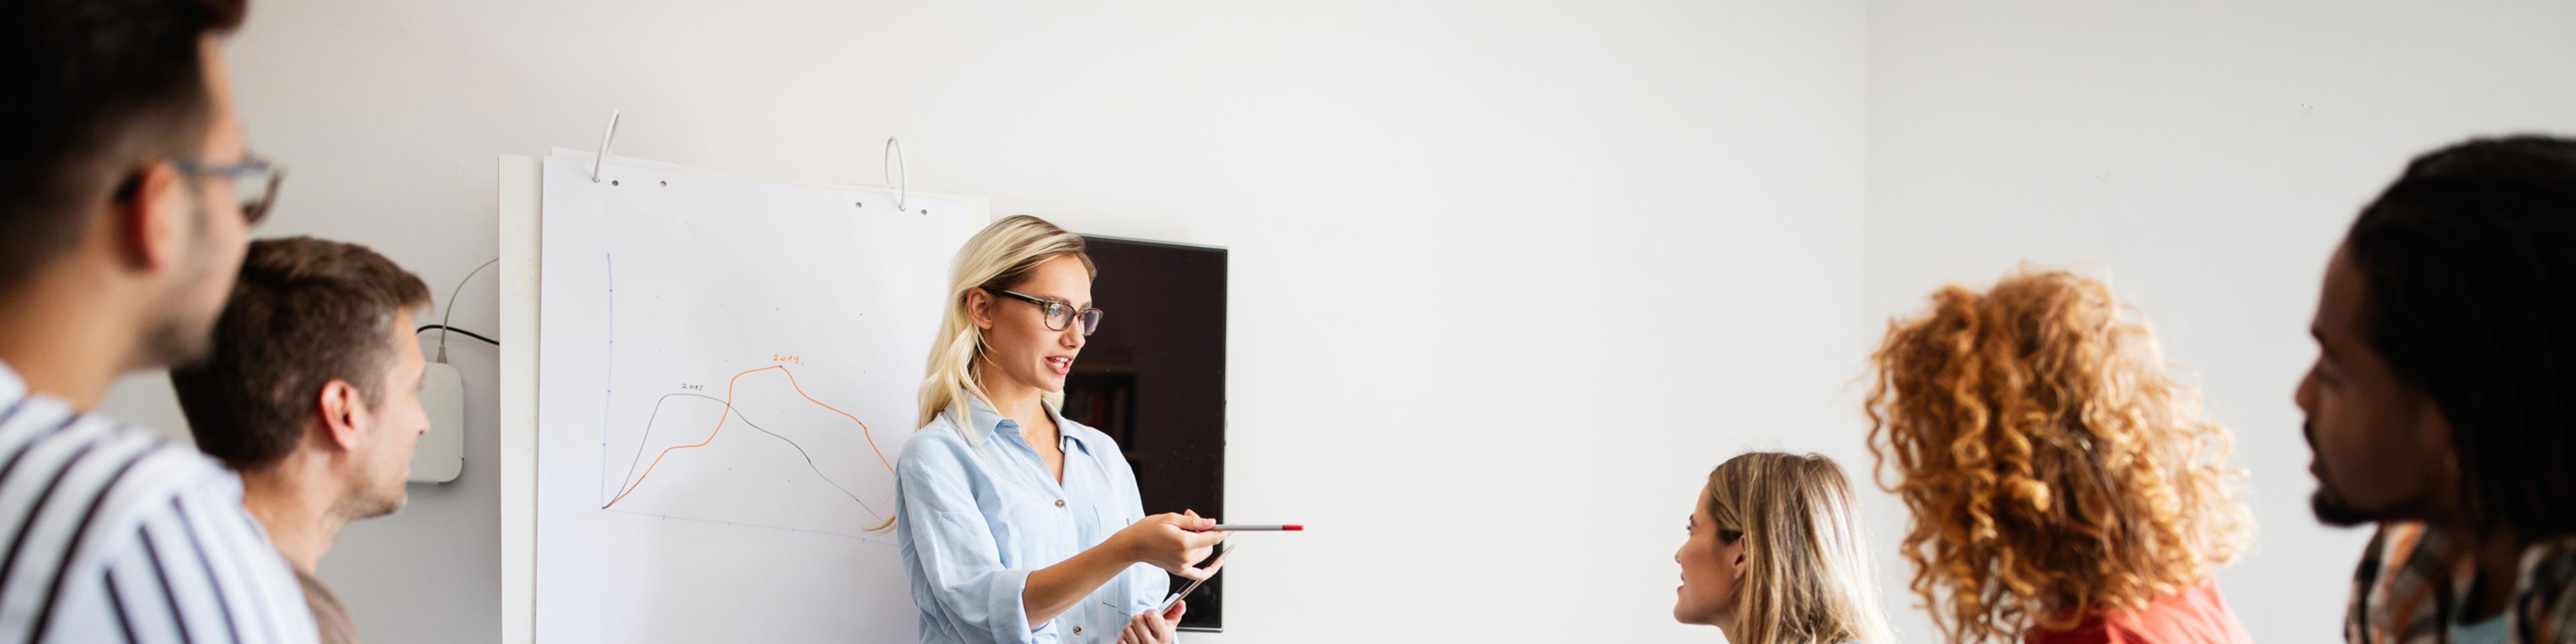 woman at white board